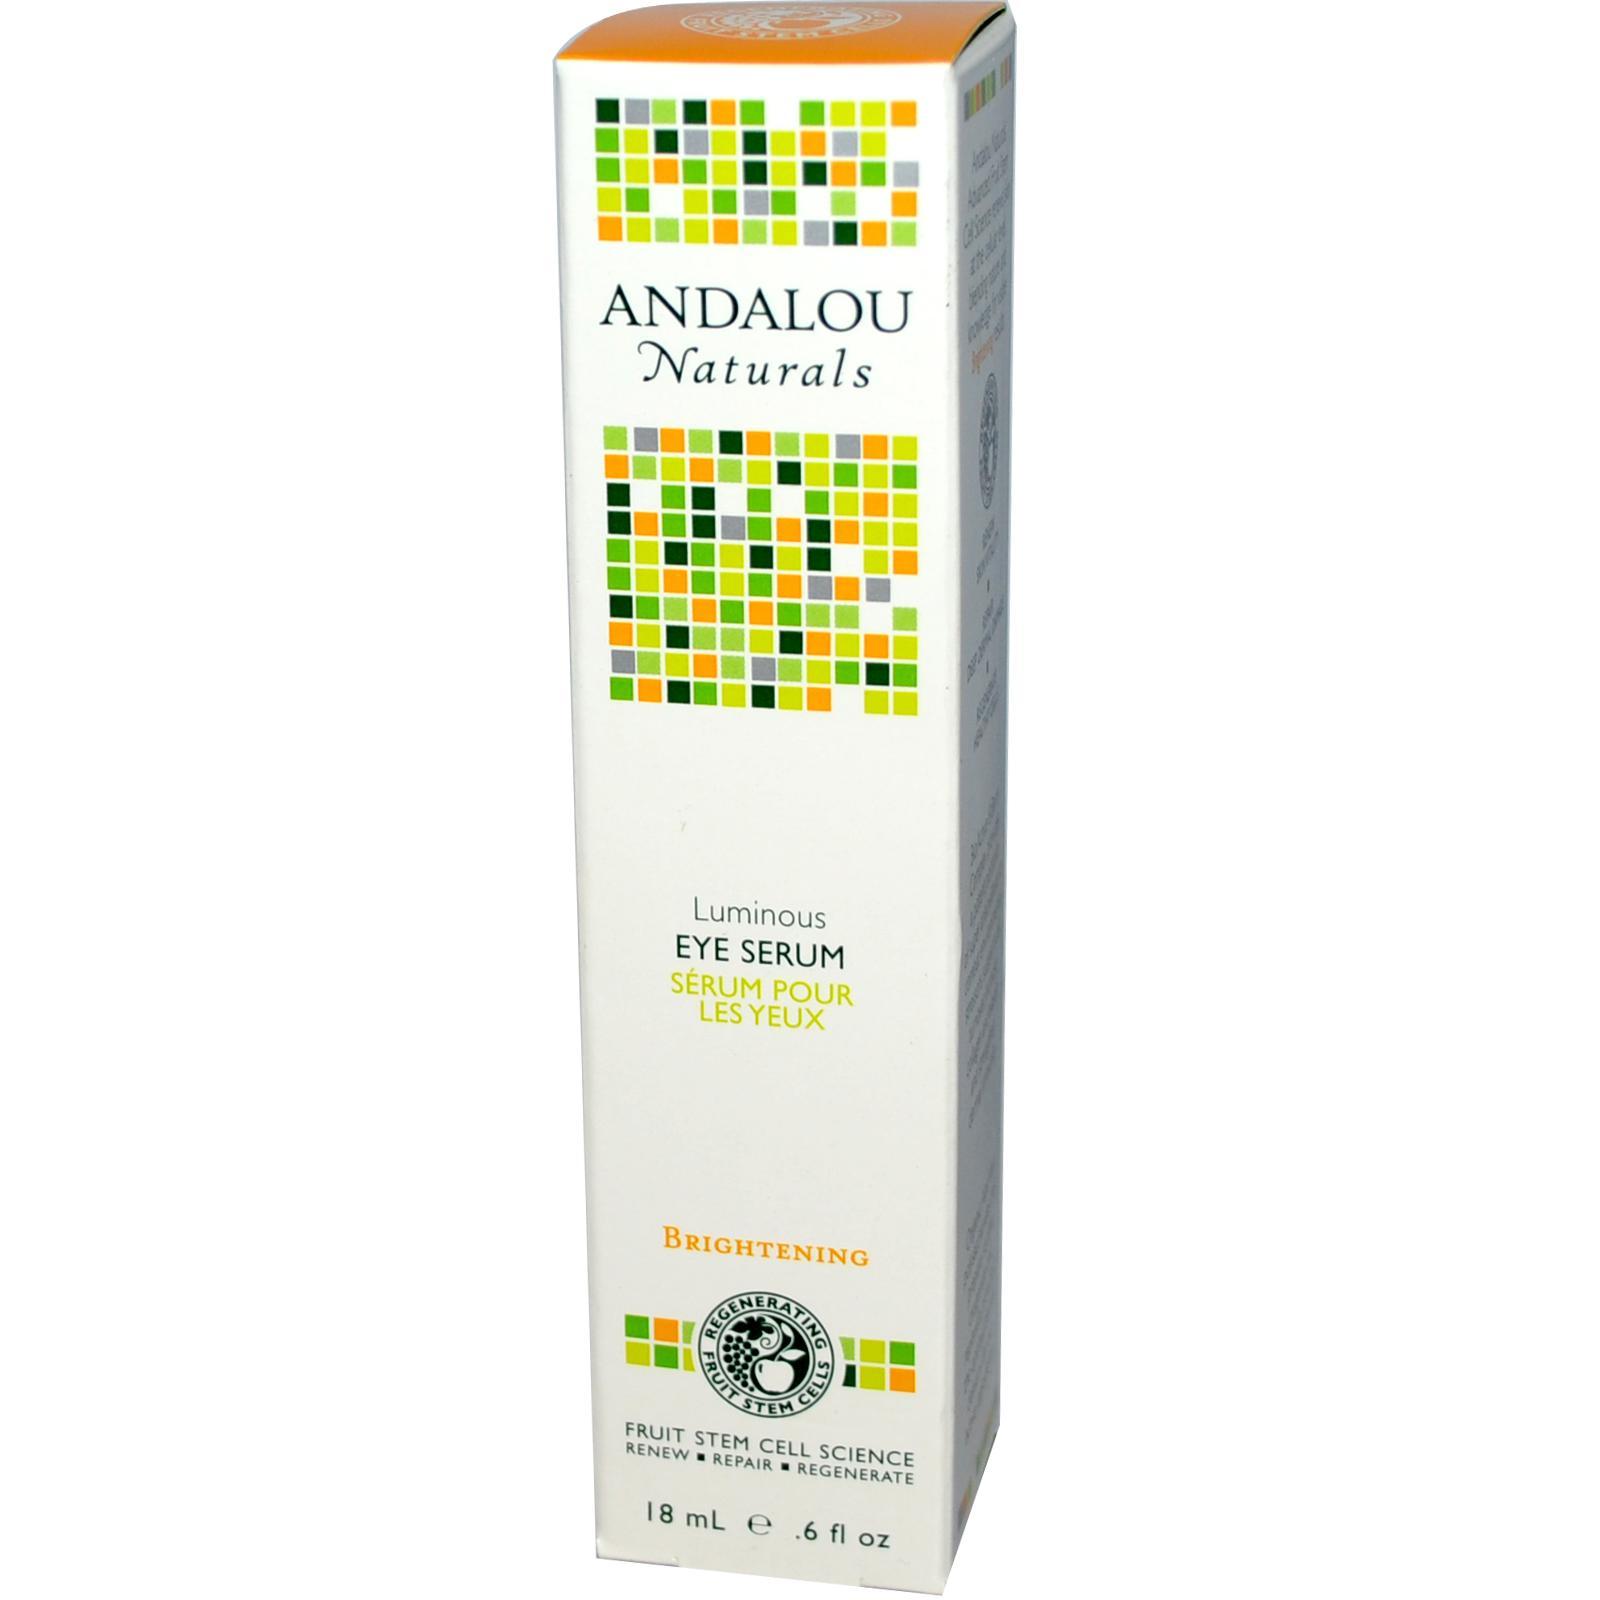 Andalou Naturals Luminous Eye Serum (1x.60 Oz)